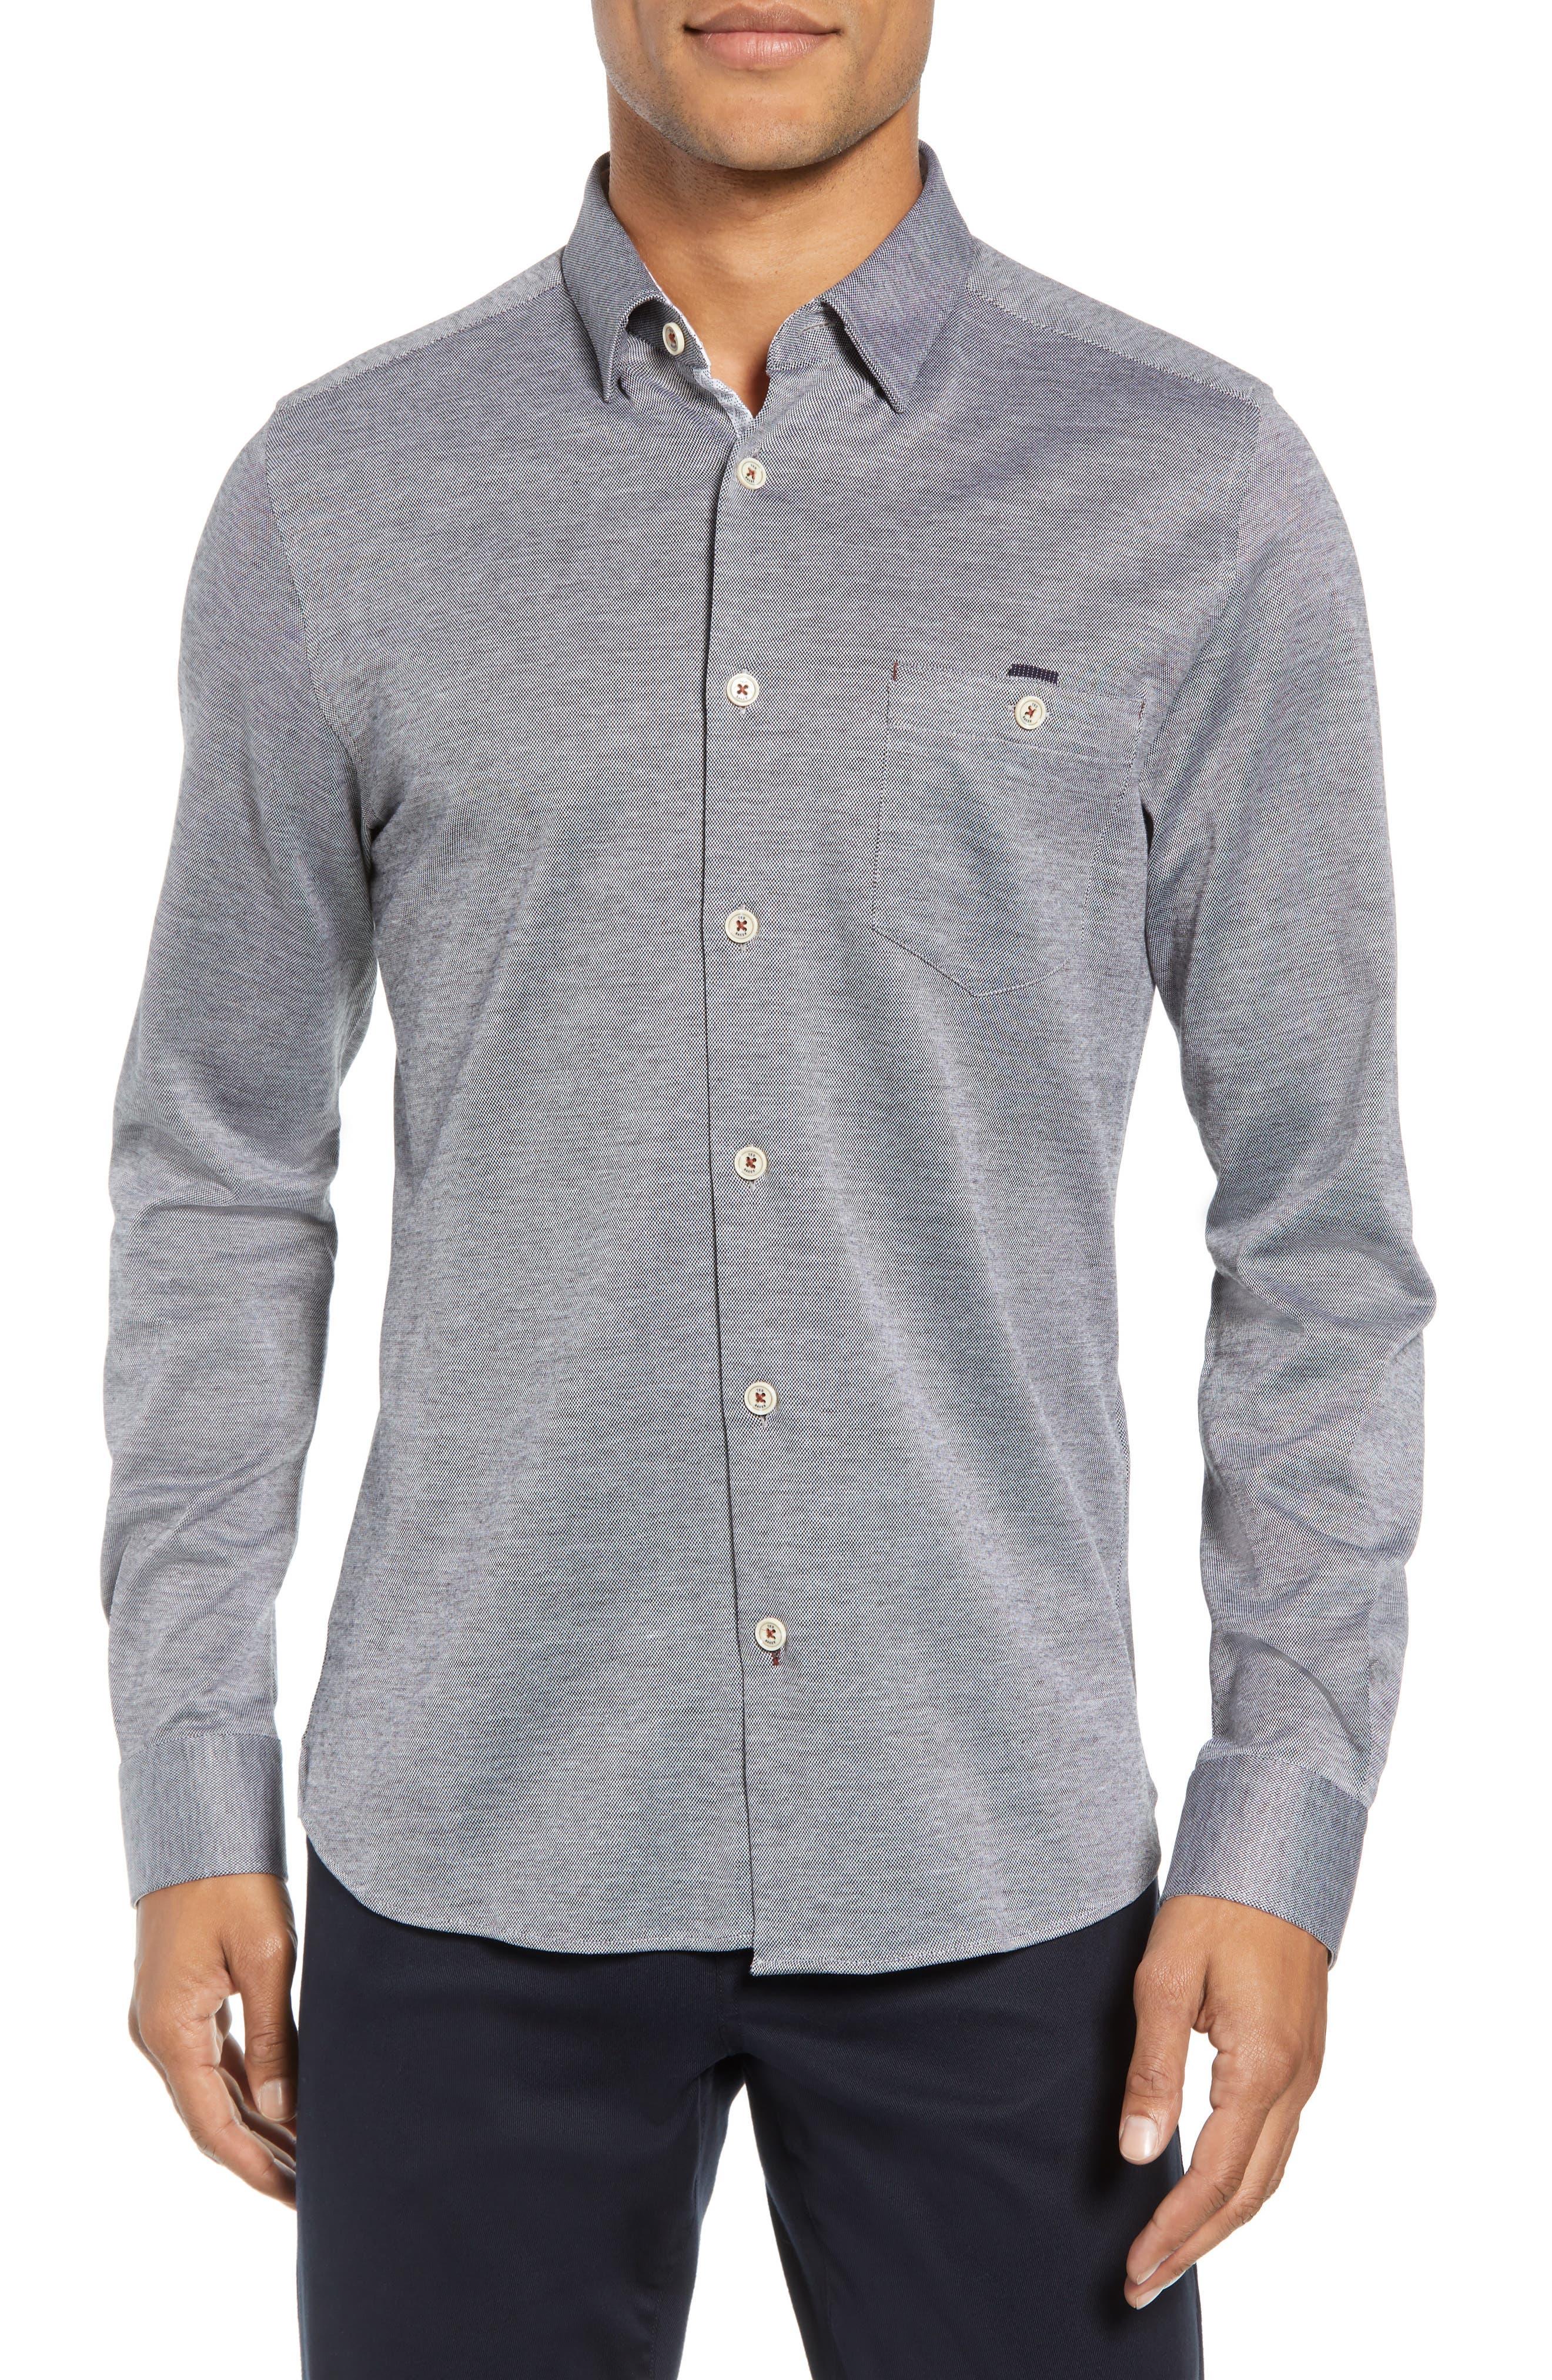 Timothy Slim Fit Cotton Jersey Shirt,                             Main thumbnail 1, color,                             BLACK